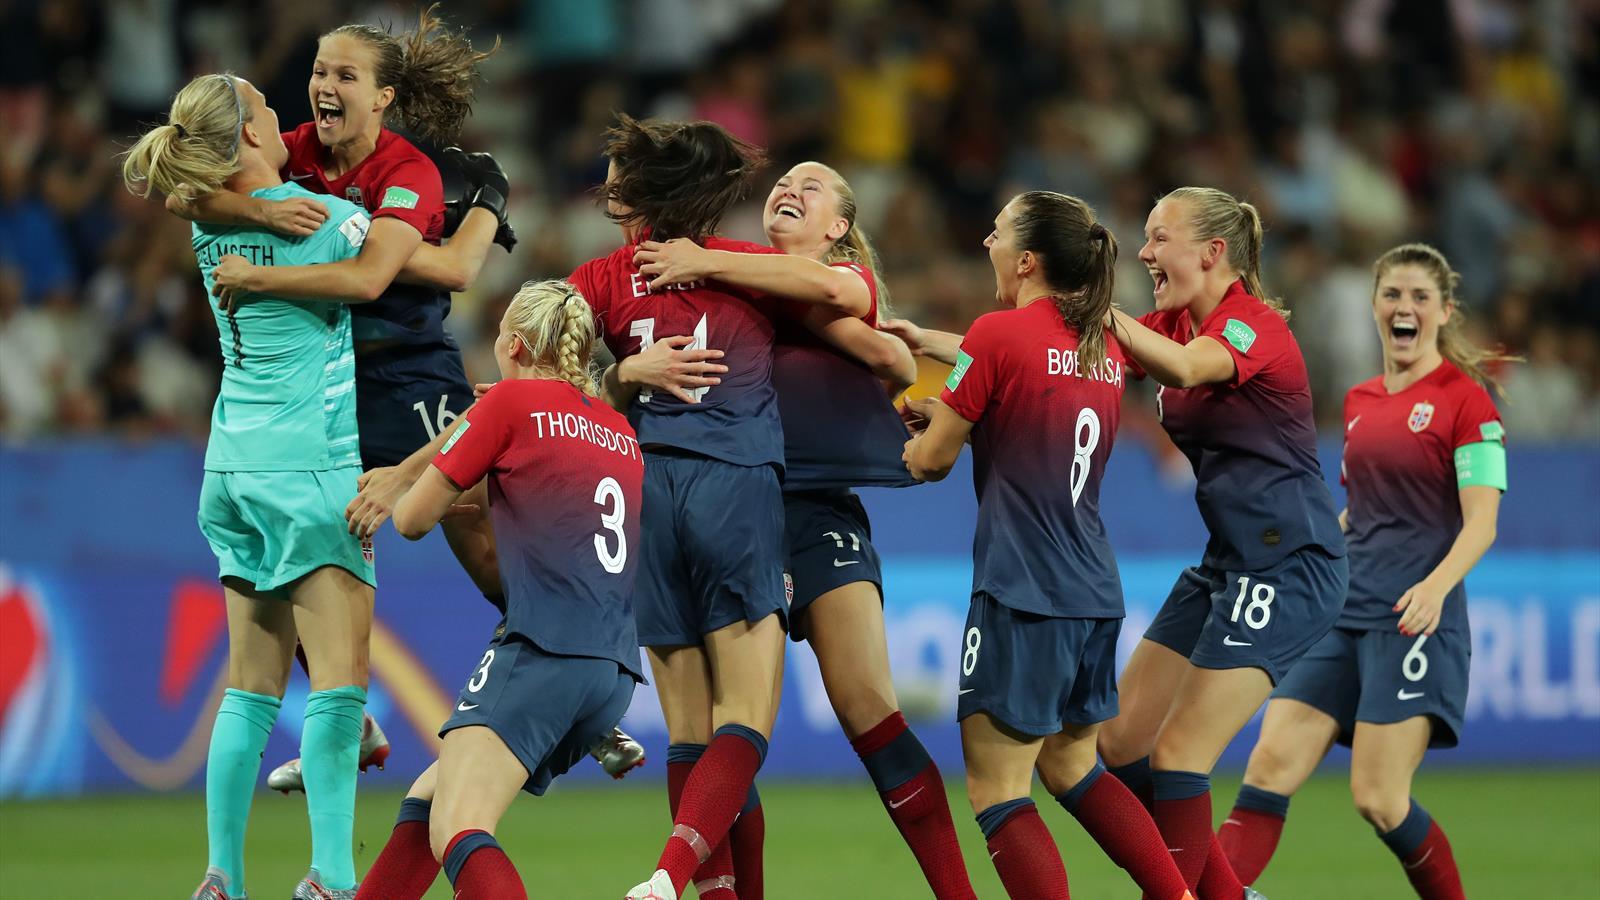 Wm Frauen FuГџball 2021